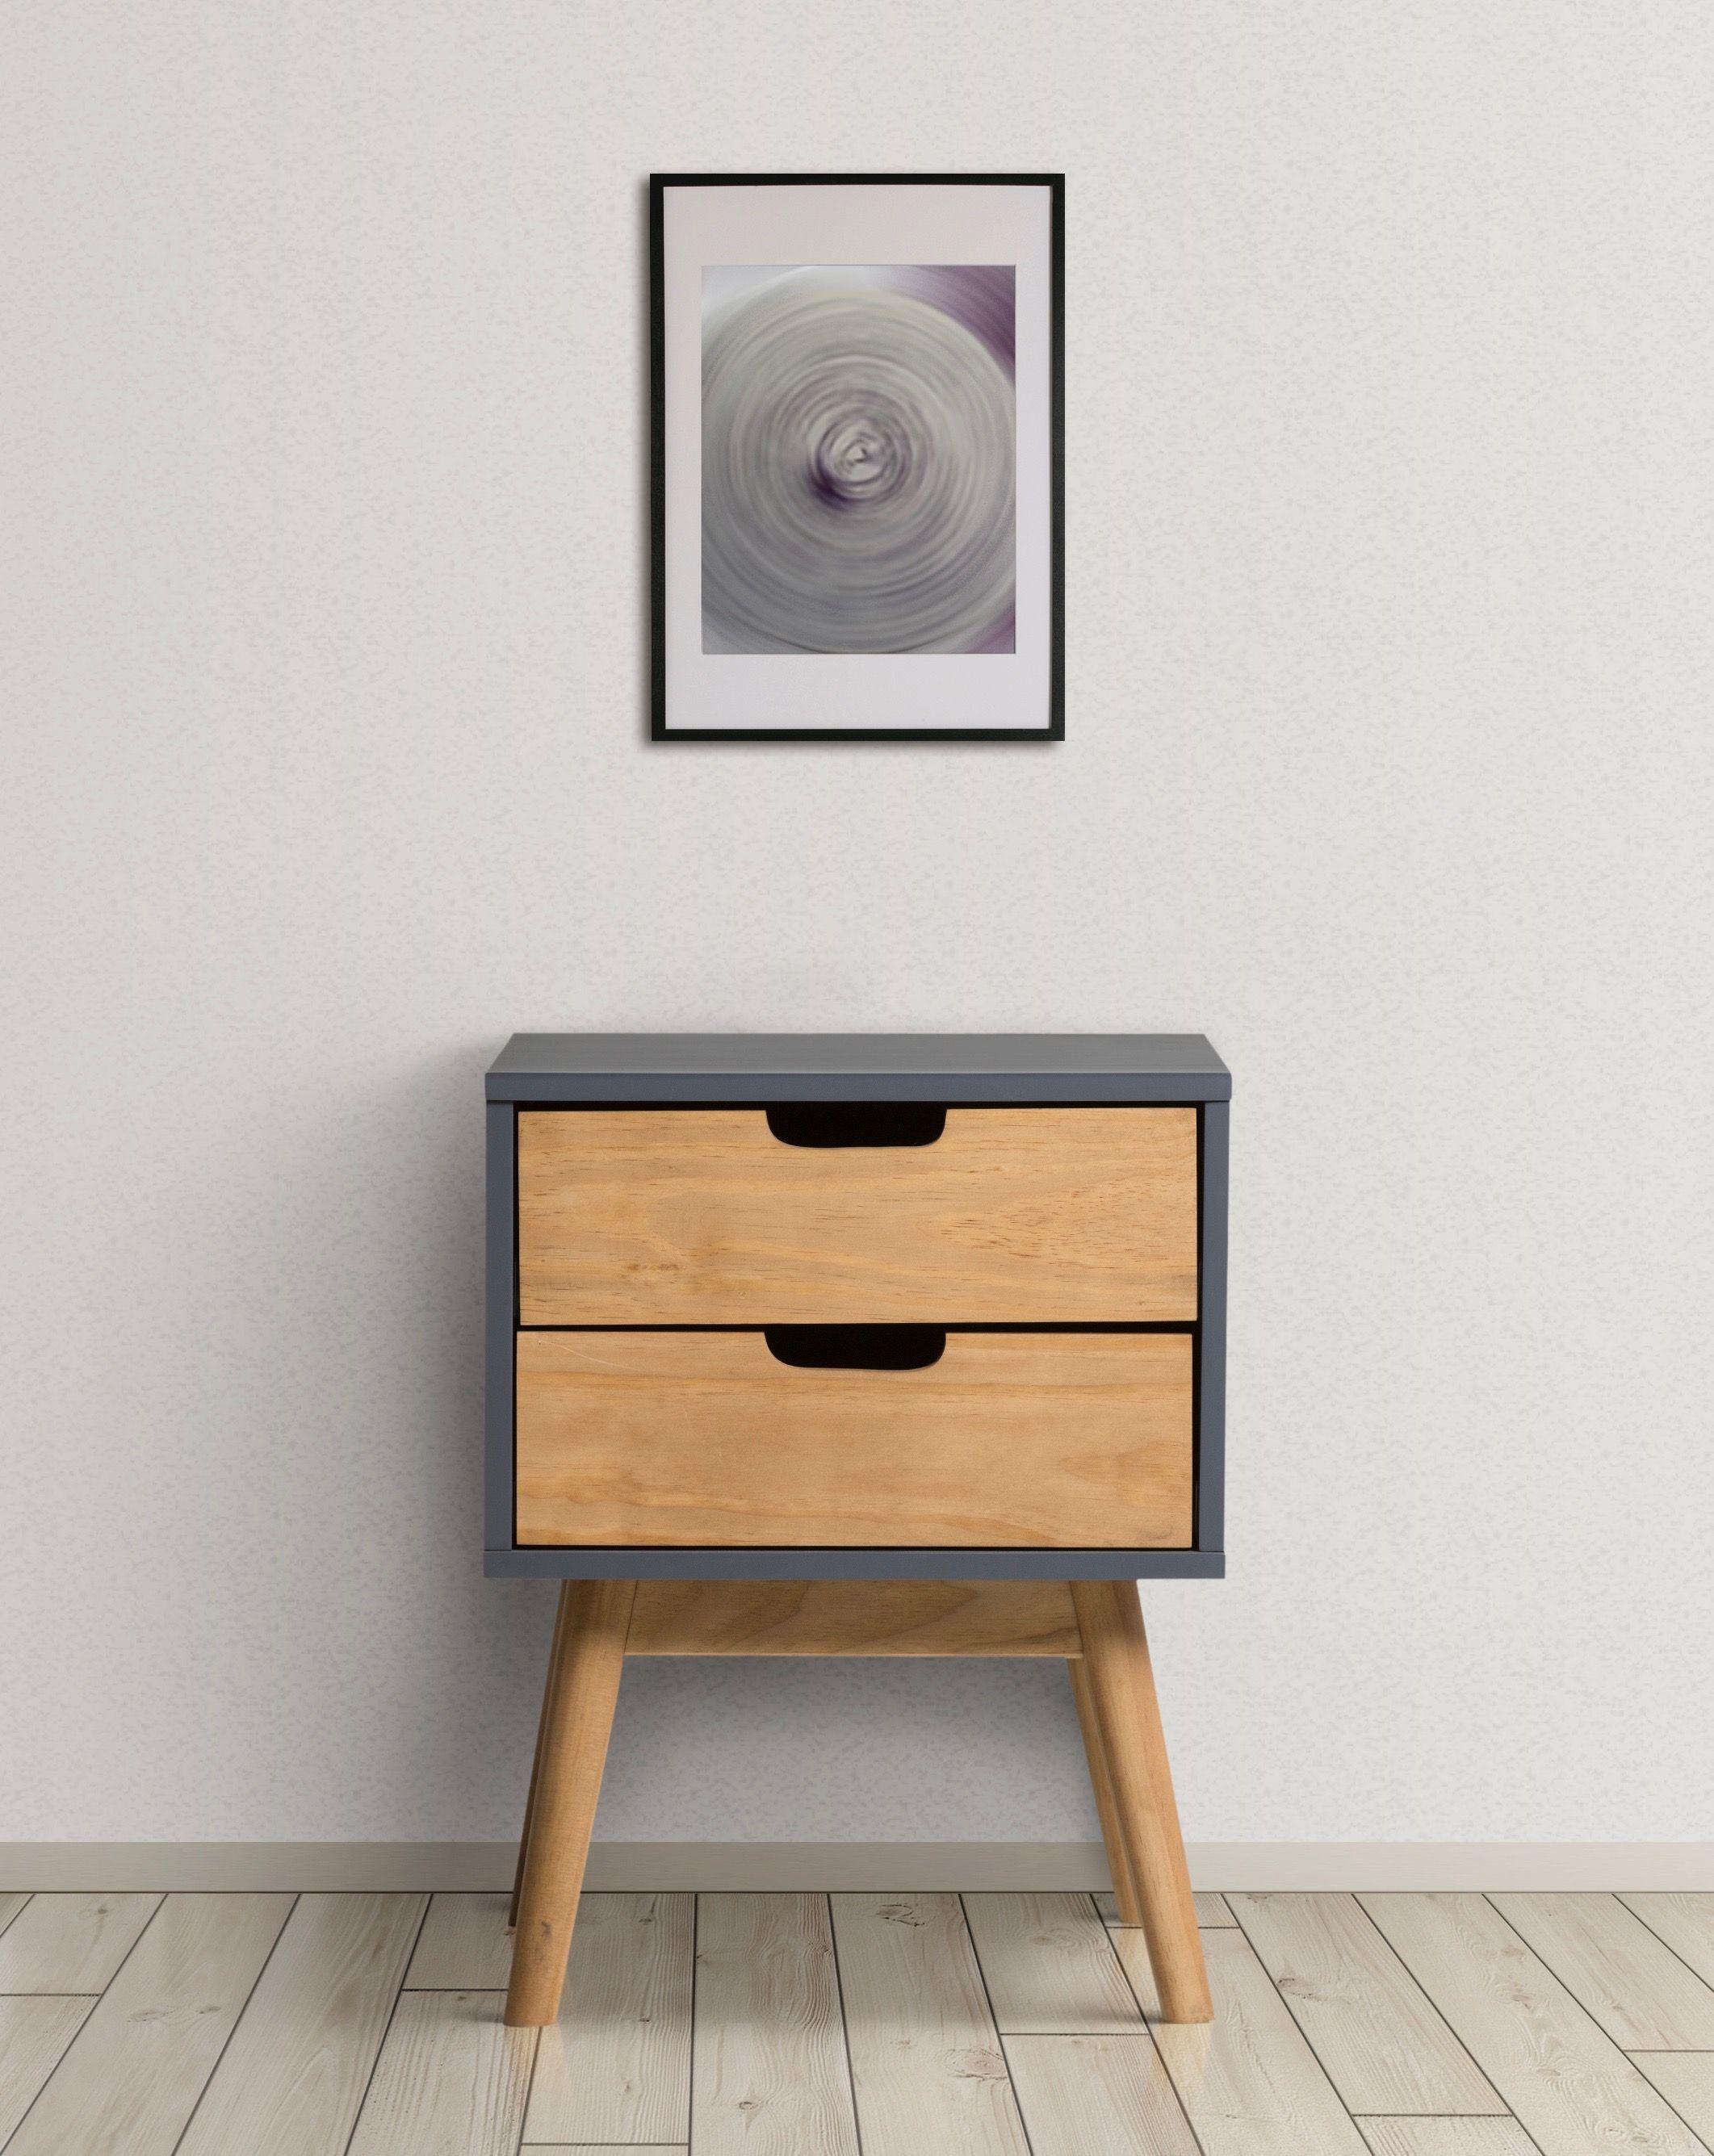 Table De Chevet Style Scandinave Bobochic Decor Home Decor Furniture